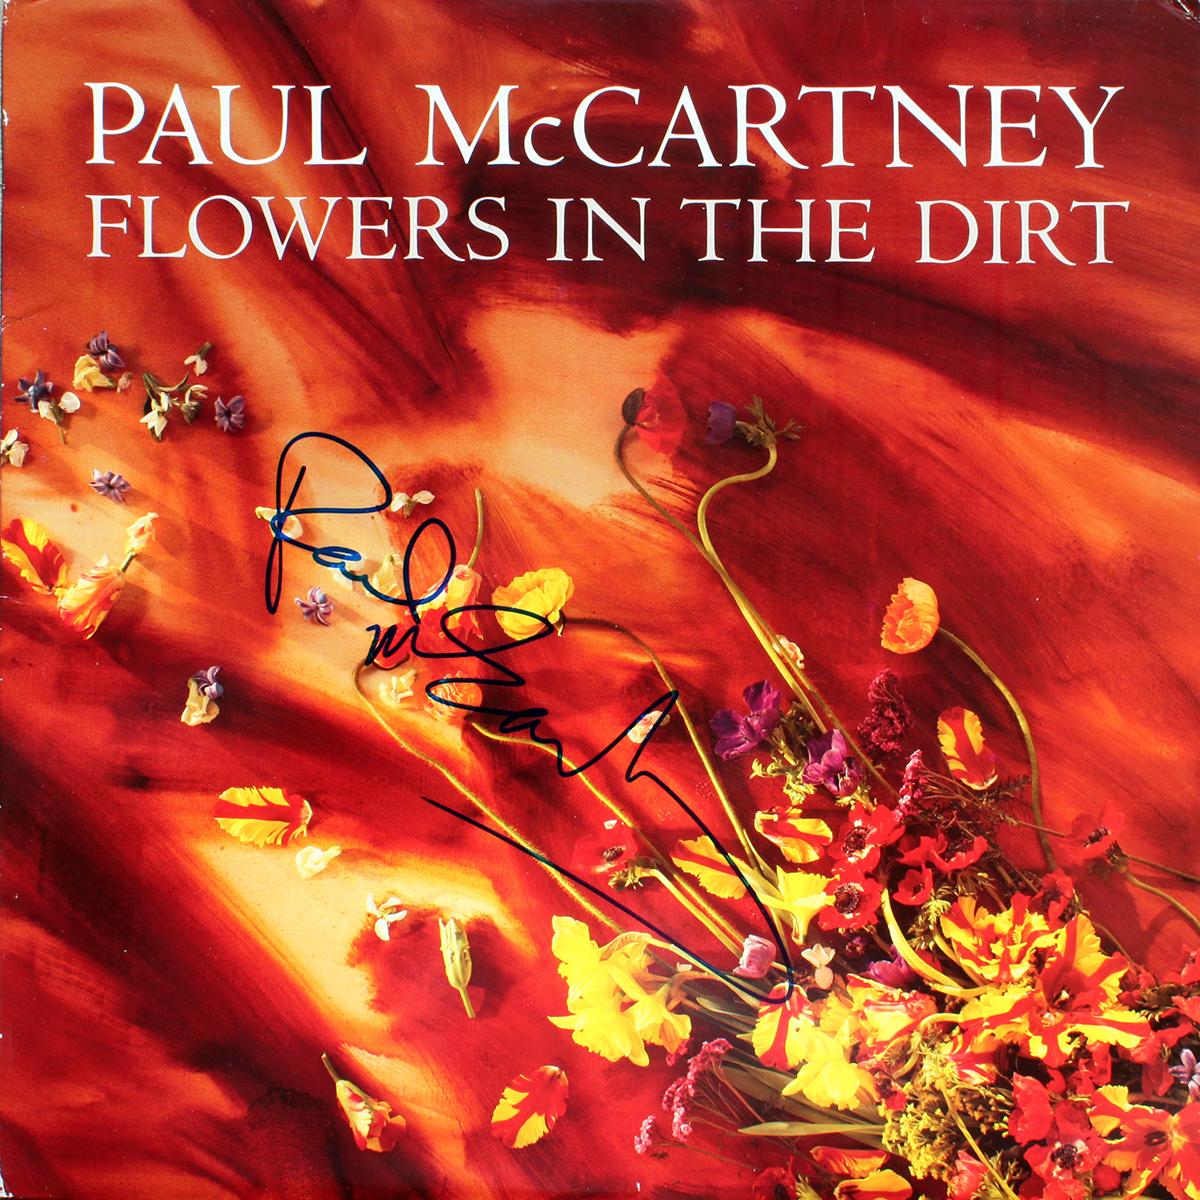 LP - Paul McCartney - Flowers In The Dirt